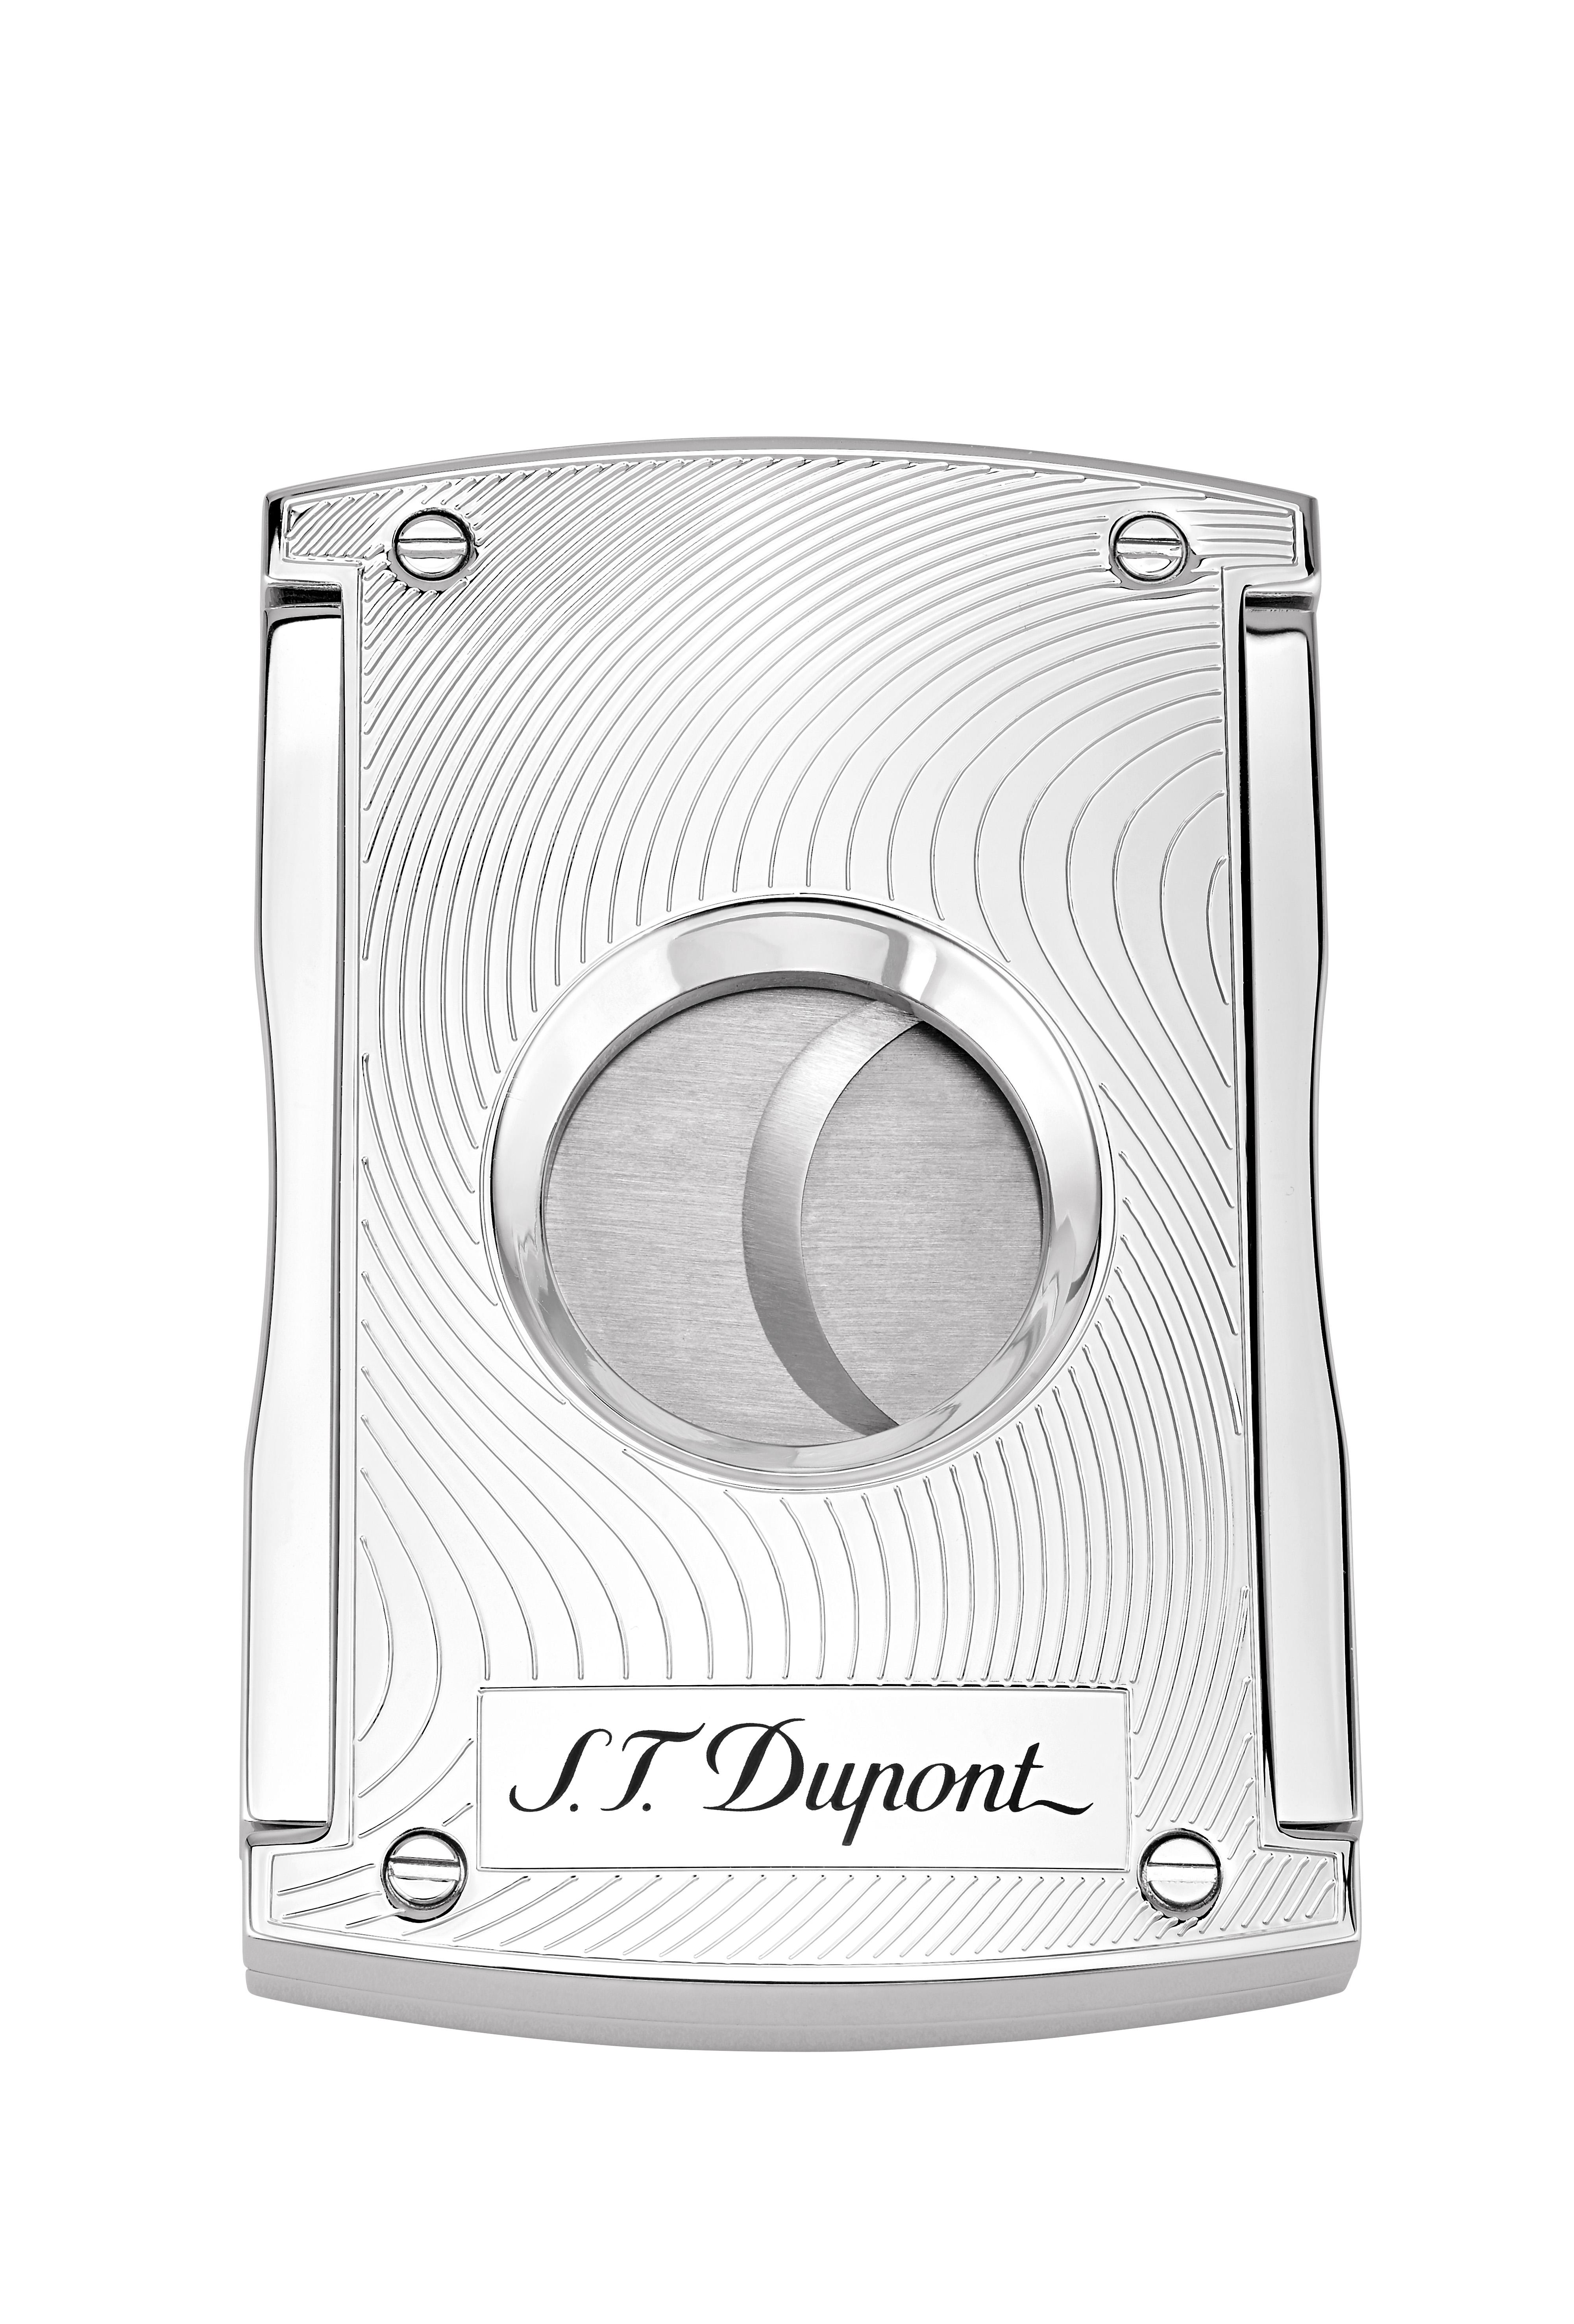 S.T. Dupont Cigar Cutter Vibration Chrome